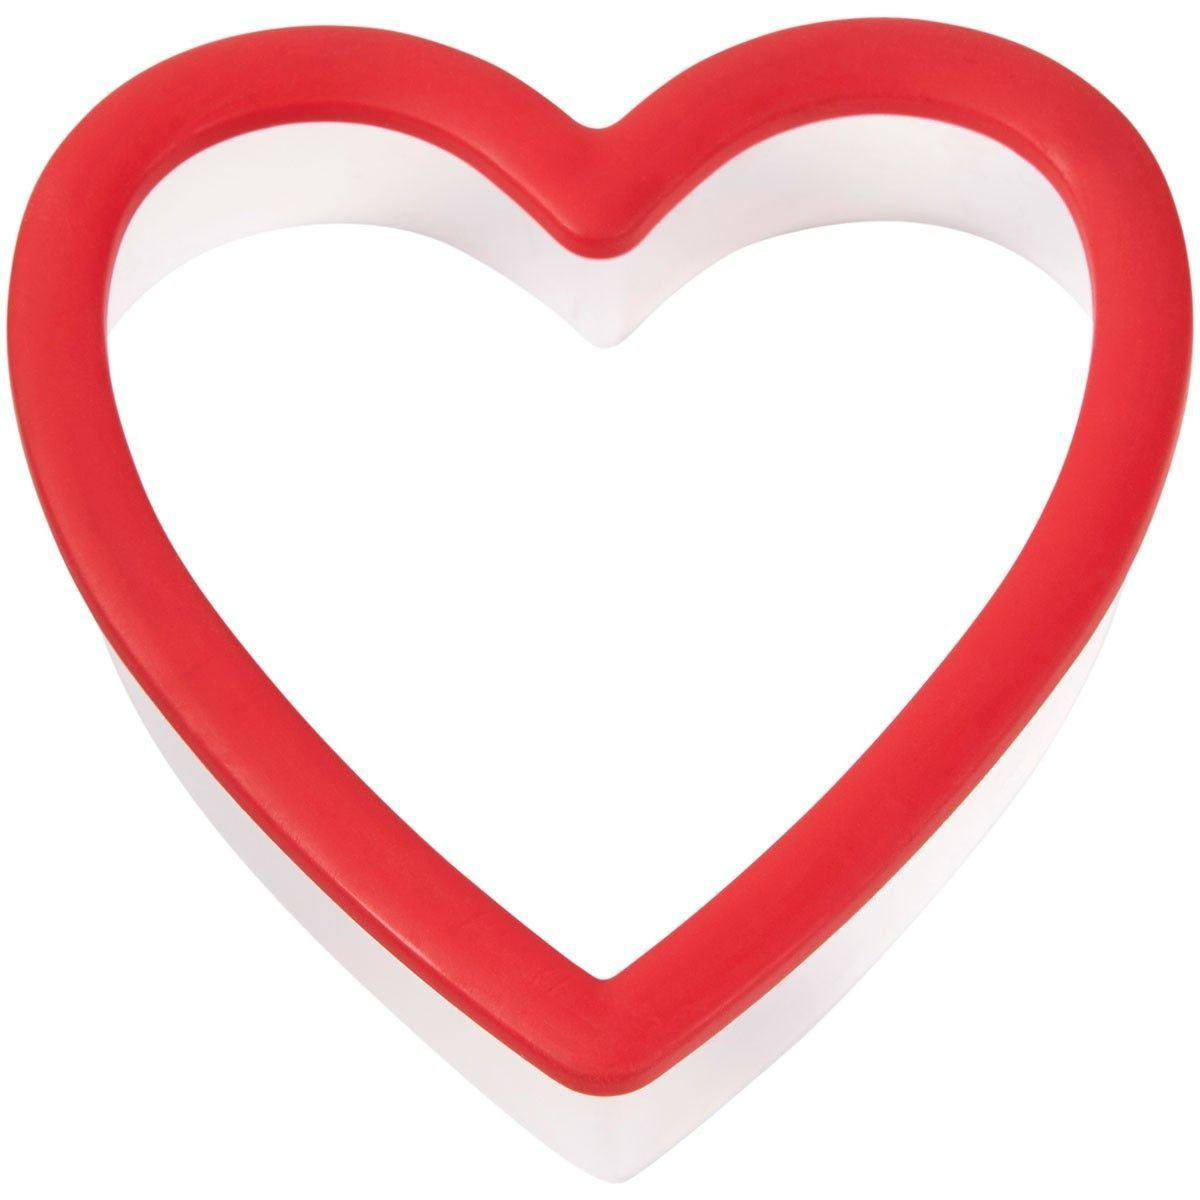 Wilton Plastic Grippy Cutter -HEART -Κουπάτ Καρδιά με λαβή σιλικόνης -9εκ